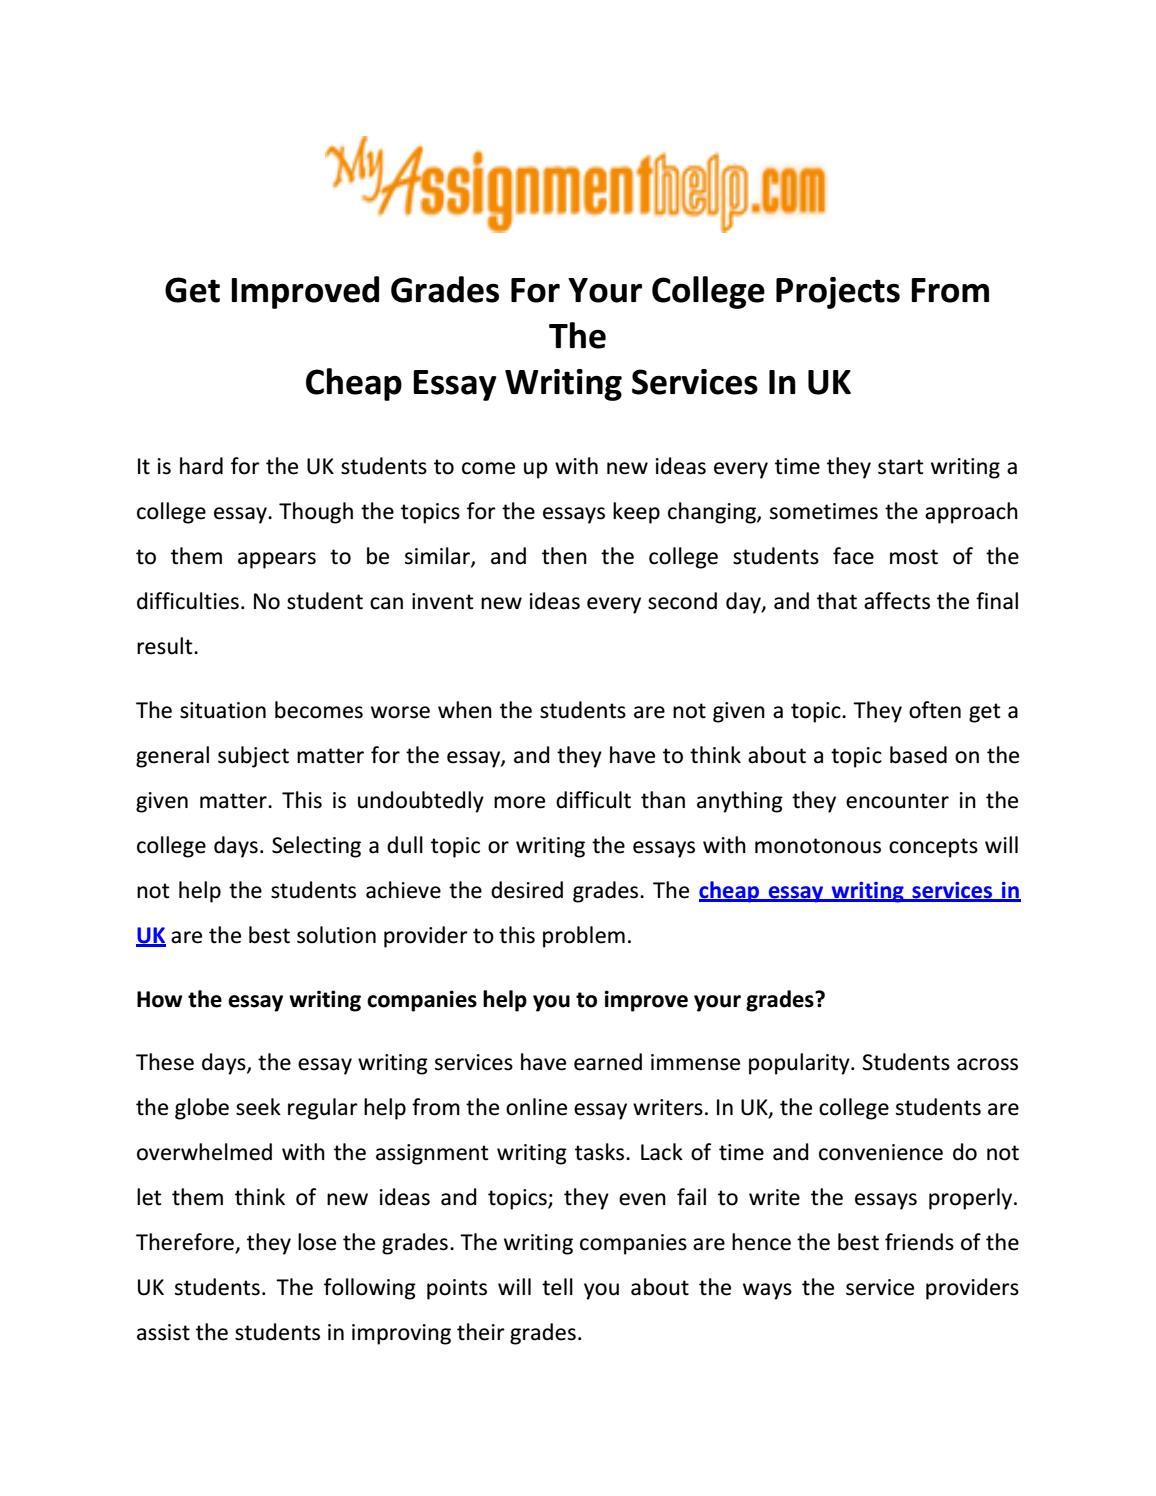 cheap essay writing uk